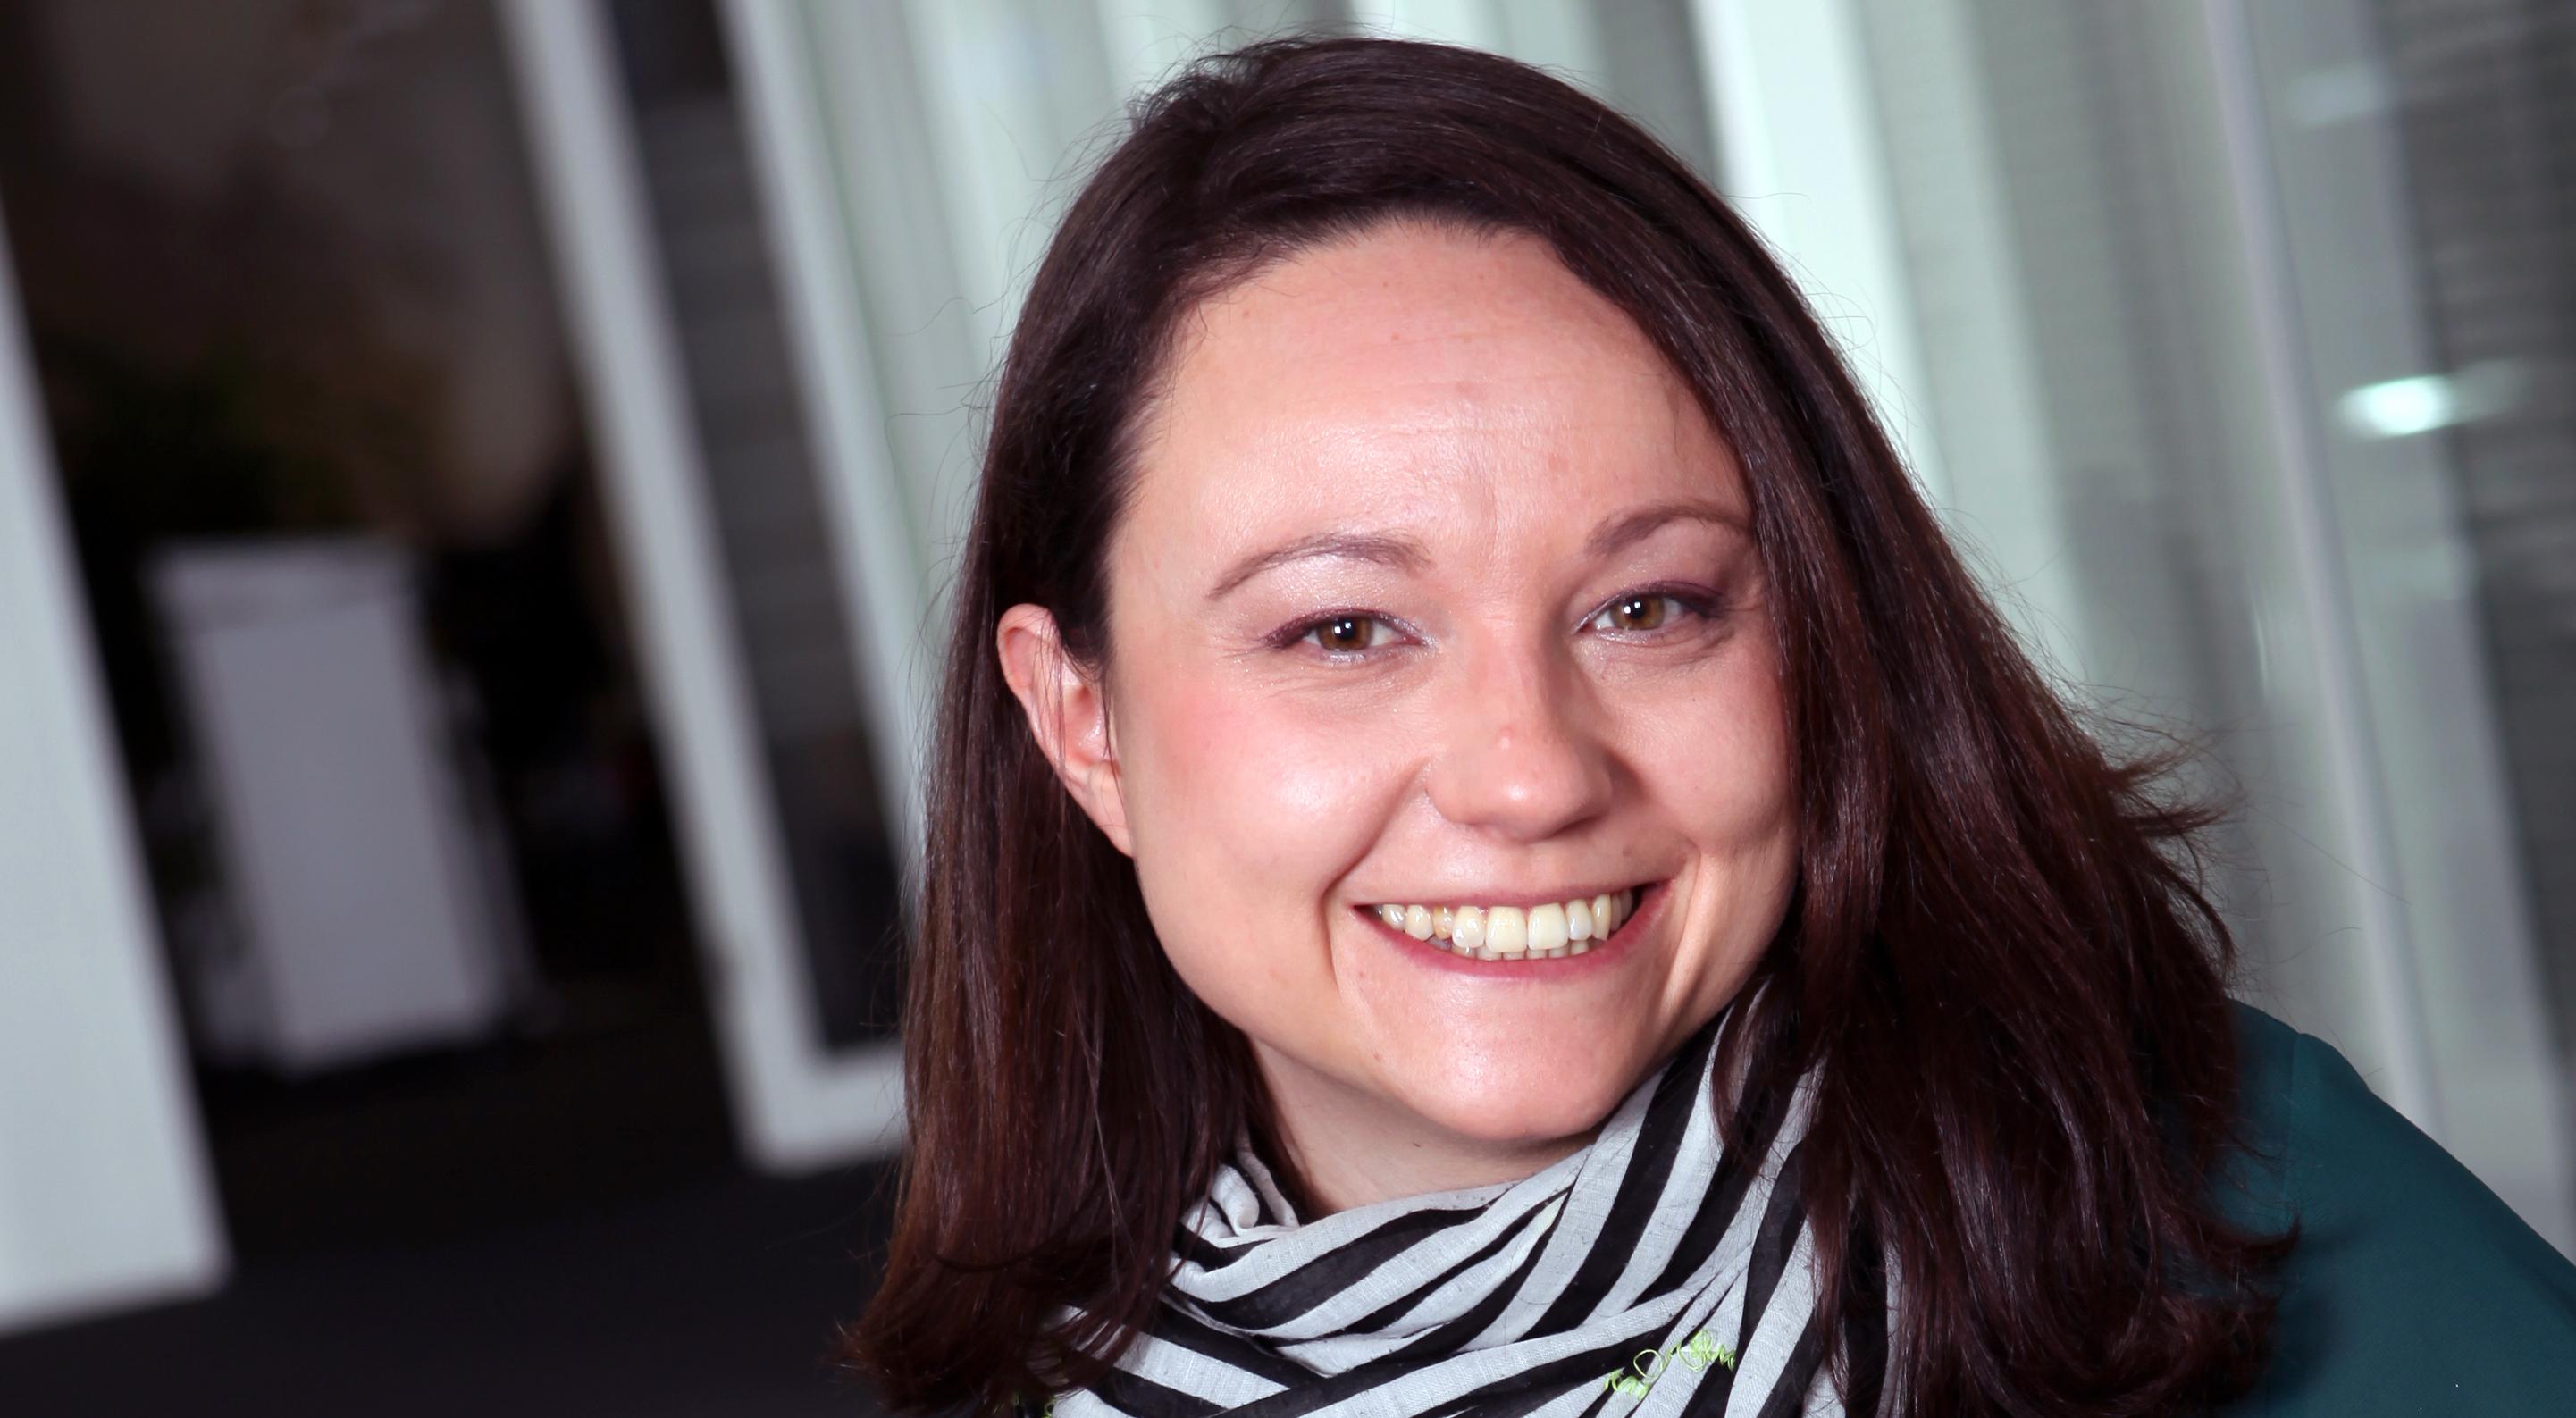 Sandra Elgaß